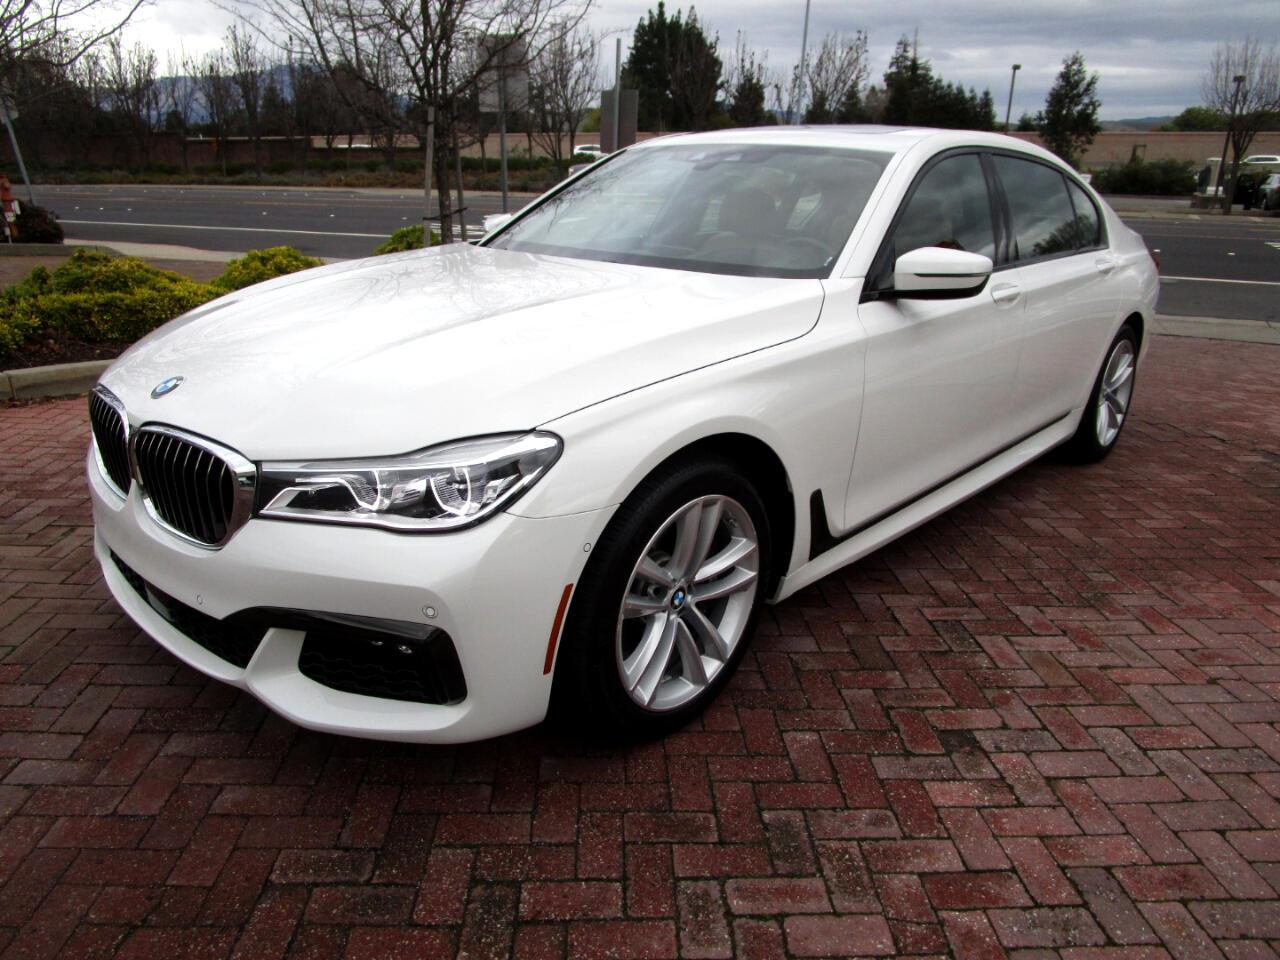 2016 BMW 750i EXEC*PRM PKG 2*M SPRT PKG*CLD WTHR PKG*BOWERS SOUN